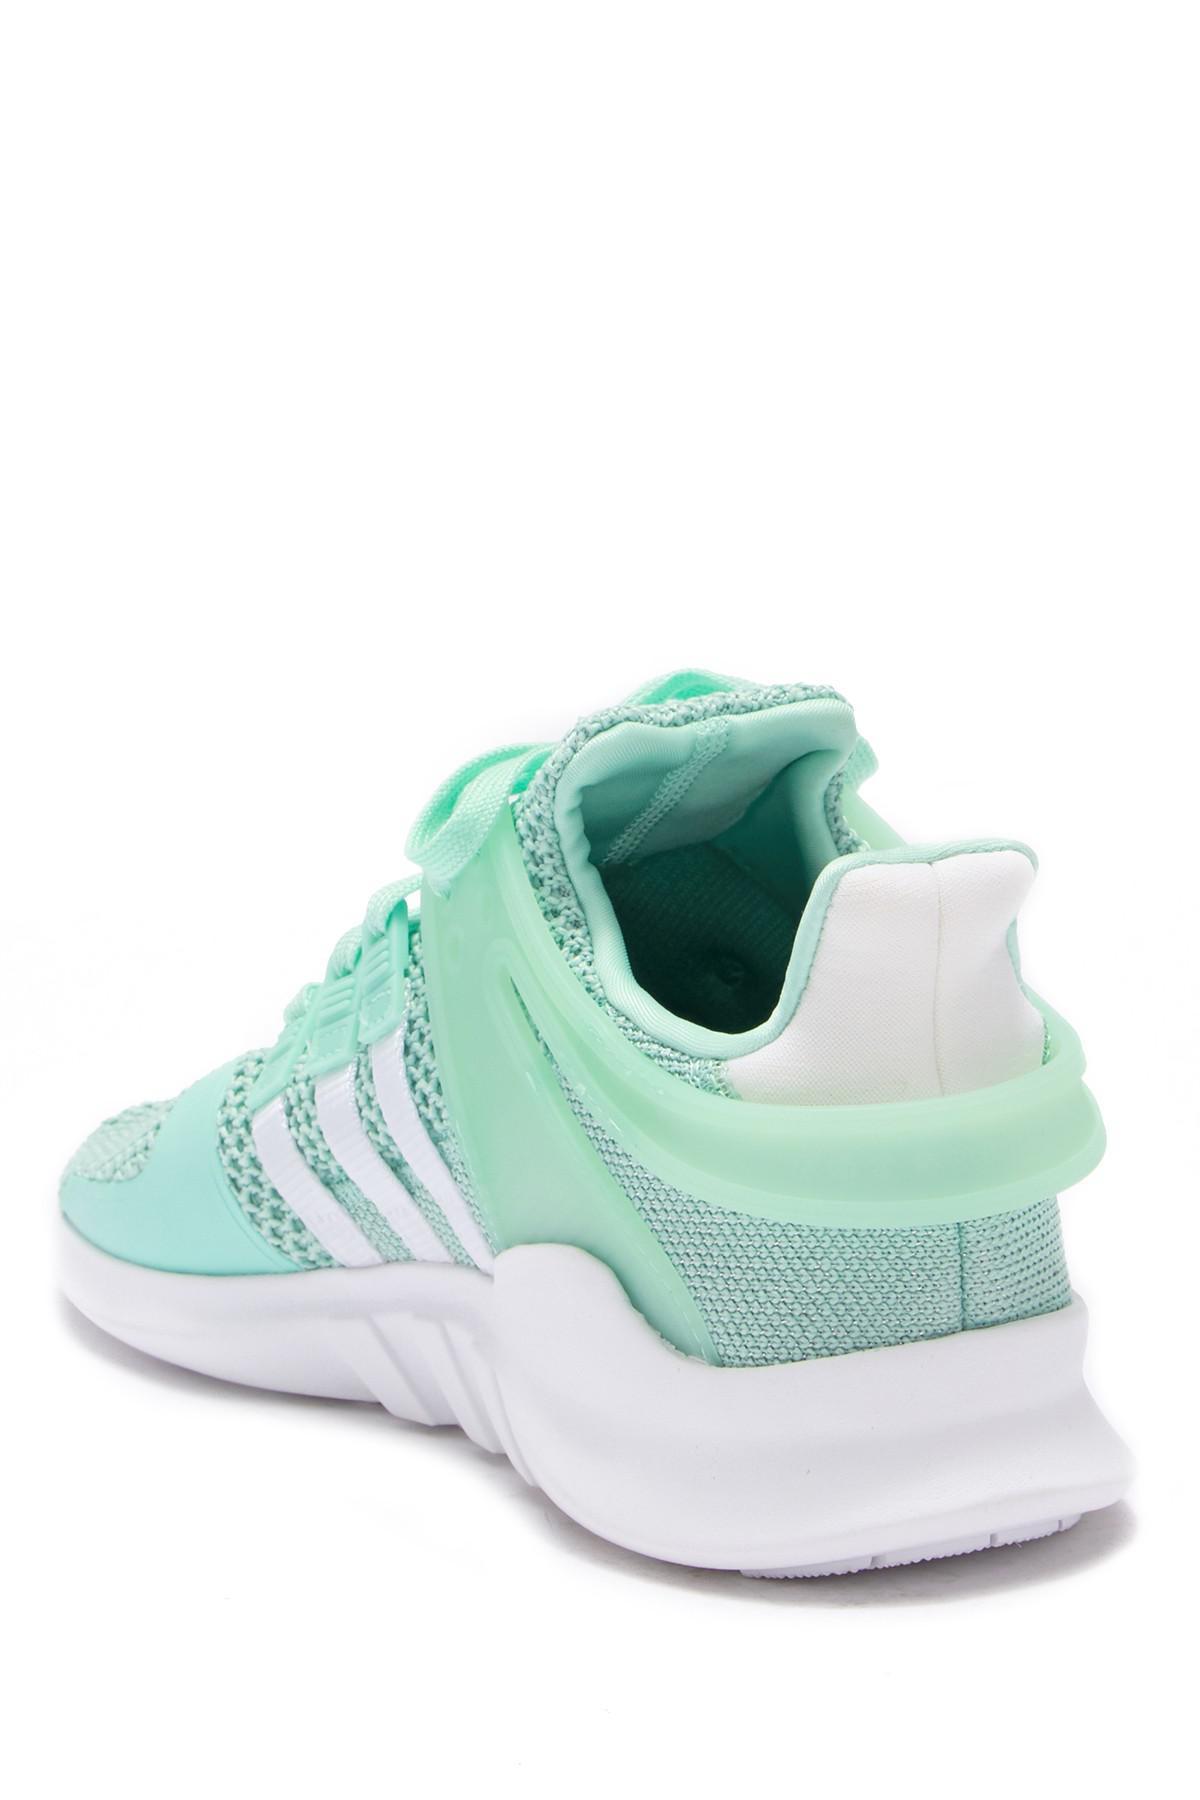 Lyst adidas Eqt Support Adv Running Sneaker